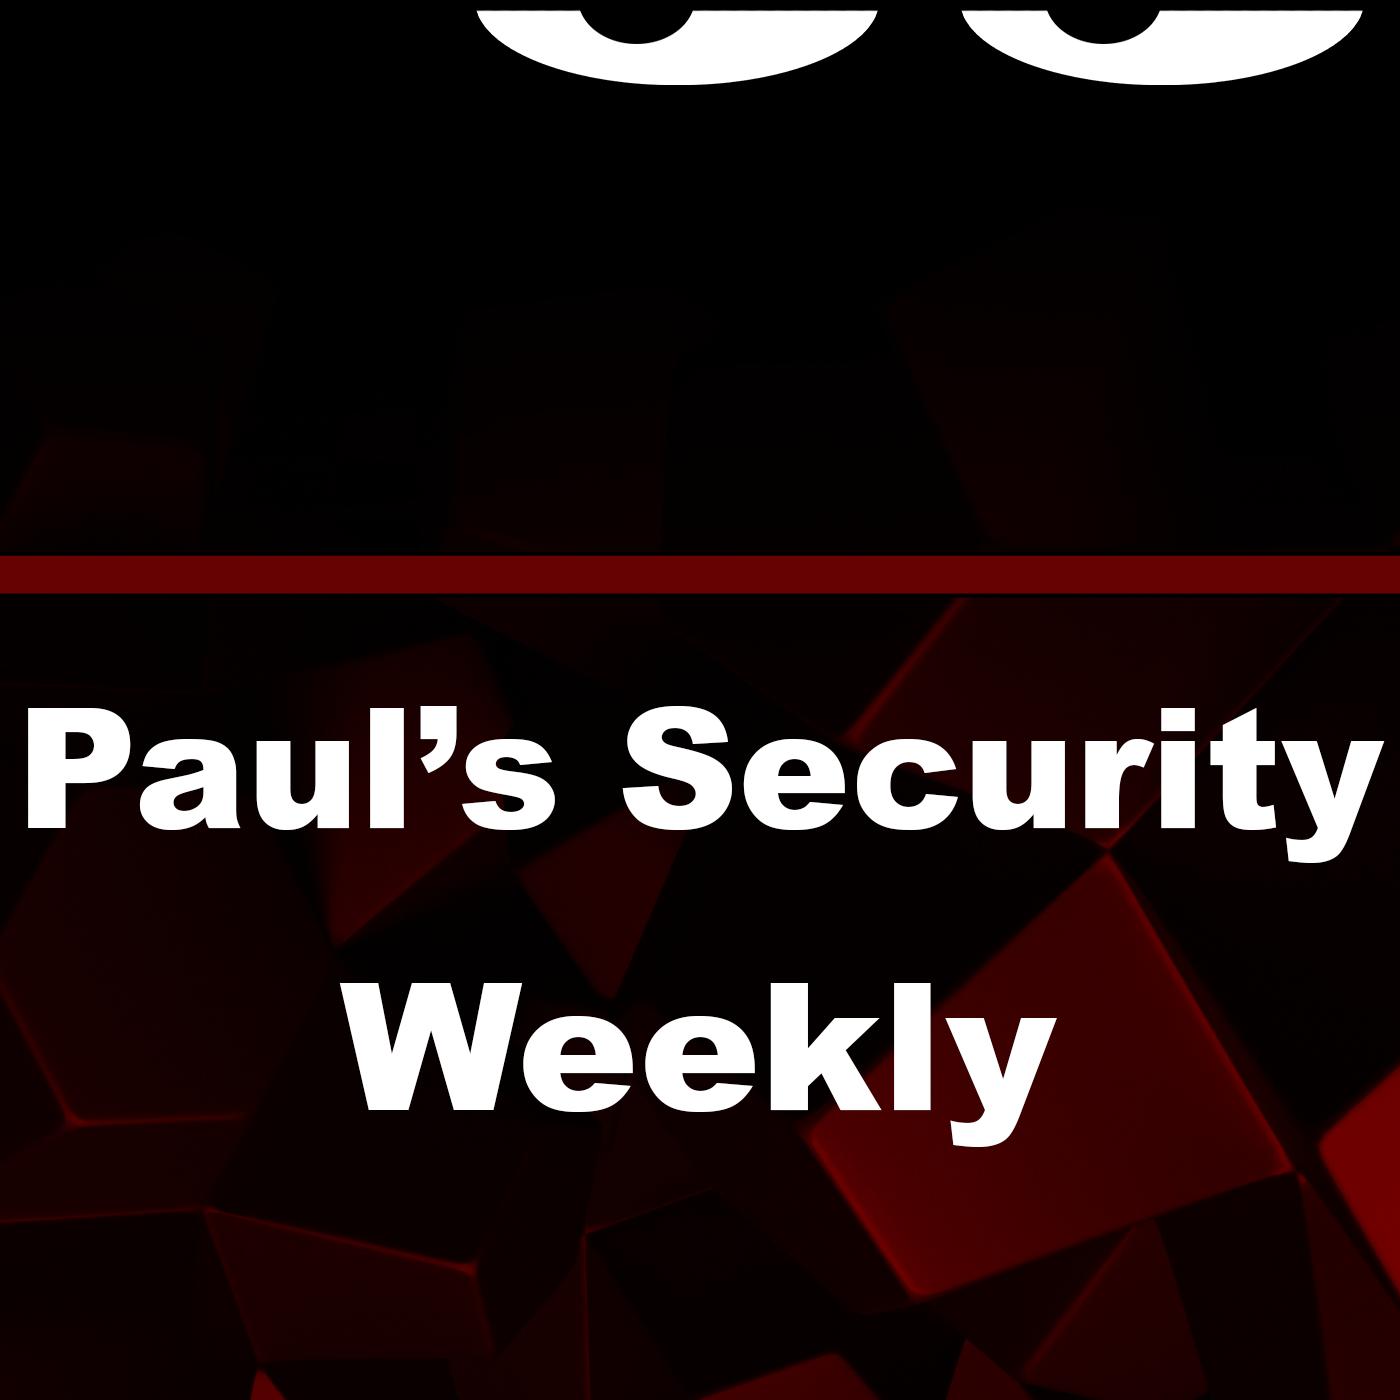 Paul's Security Weekly TV show art